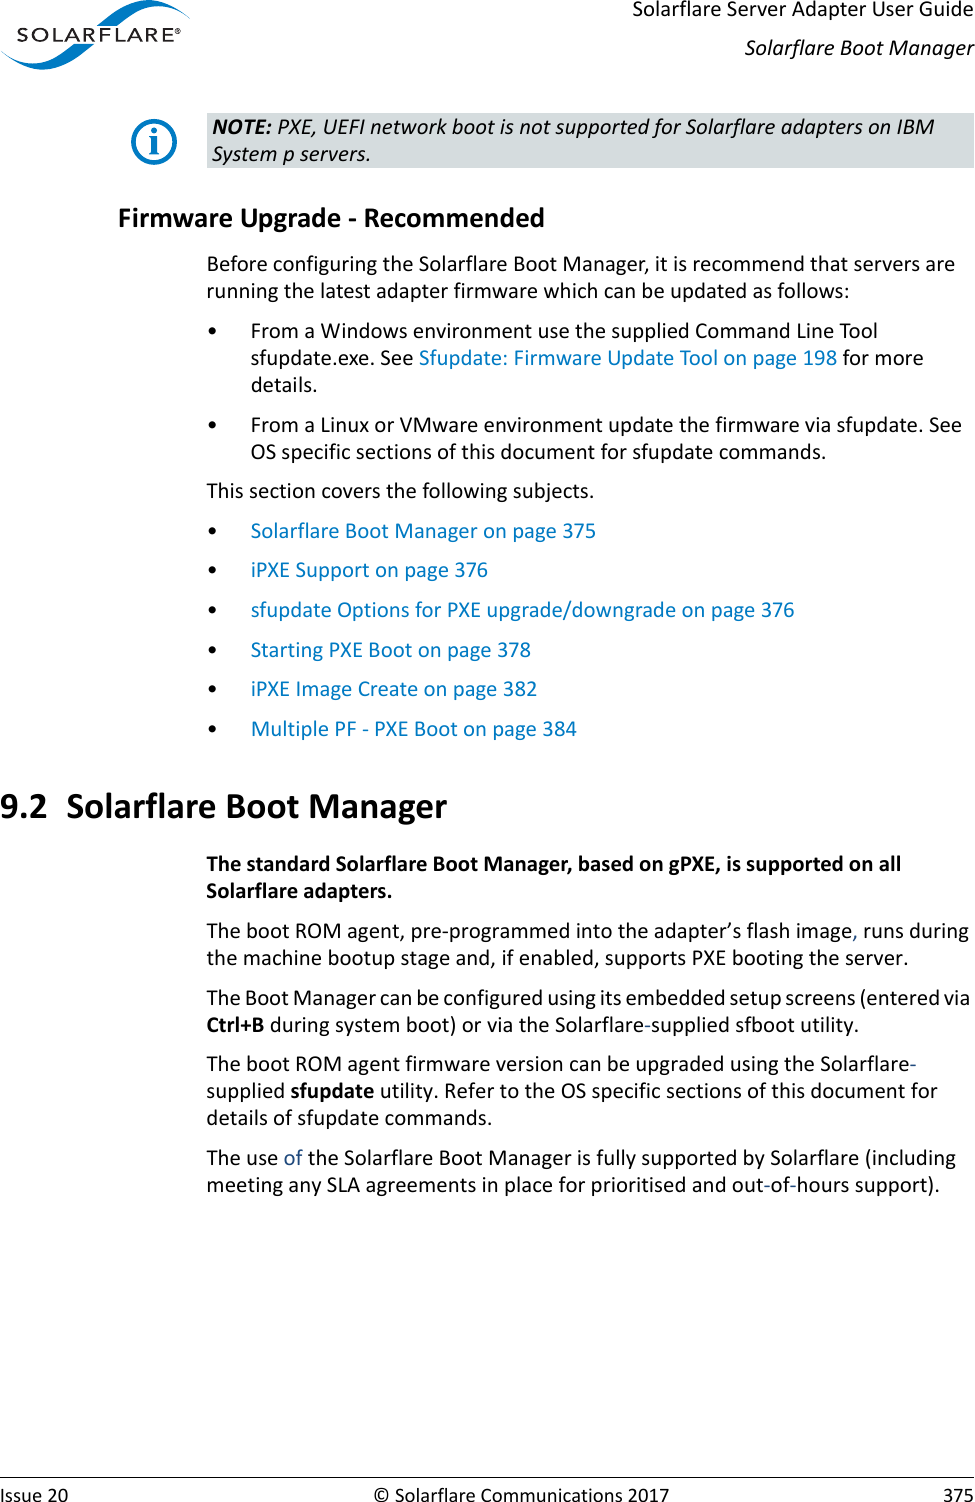 Solarflare Server Adapter User Guide SF 103837 CD 20 S